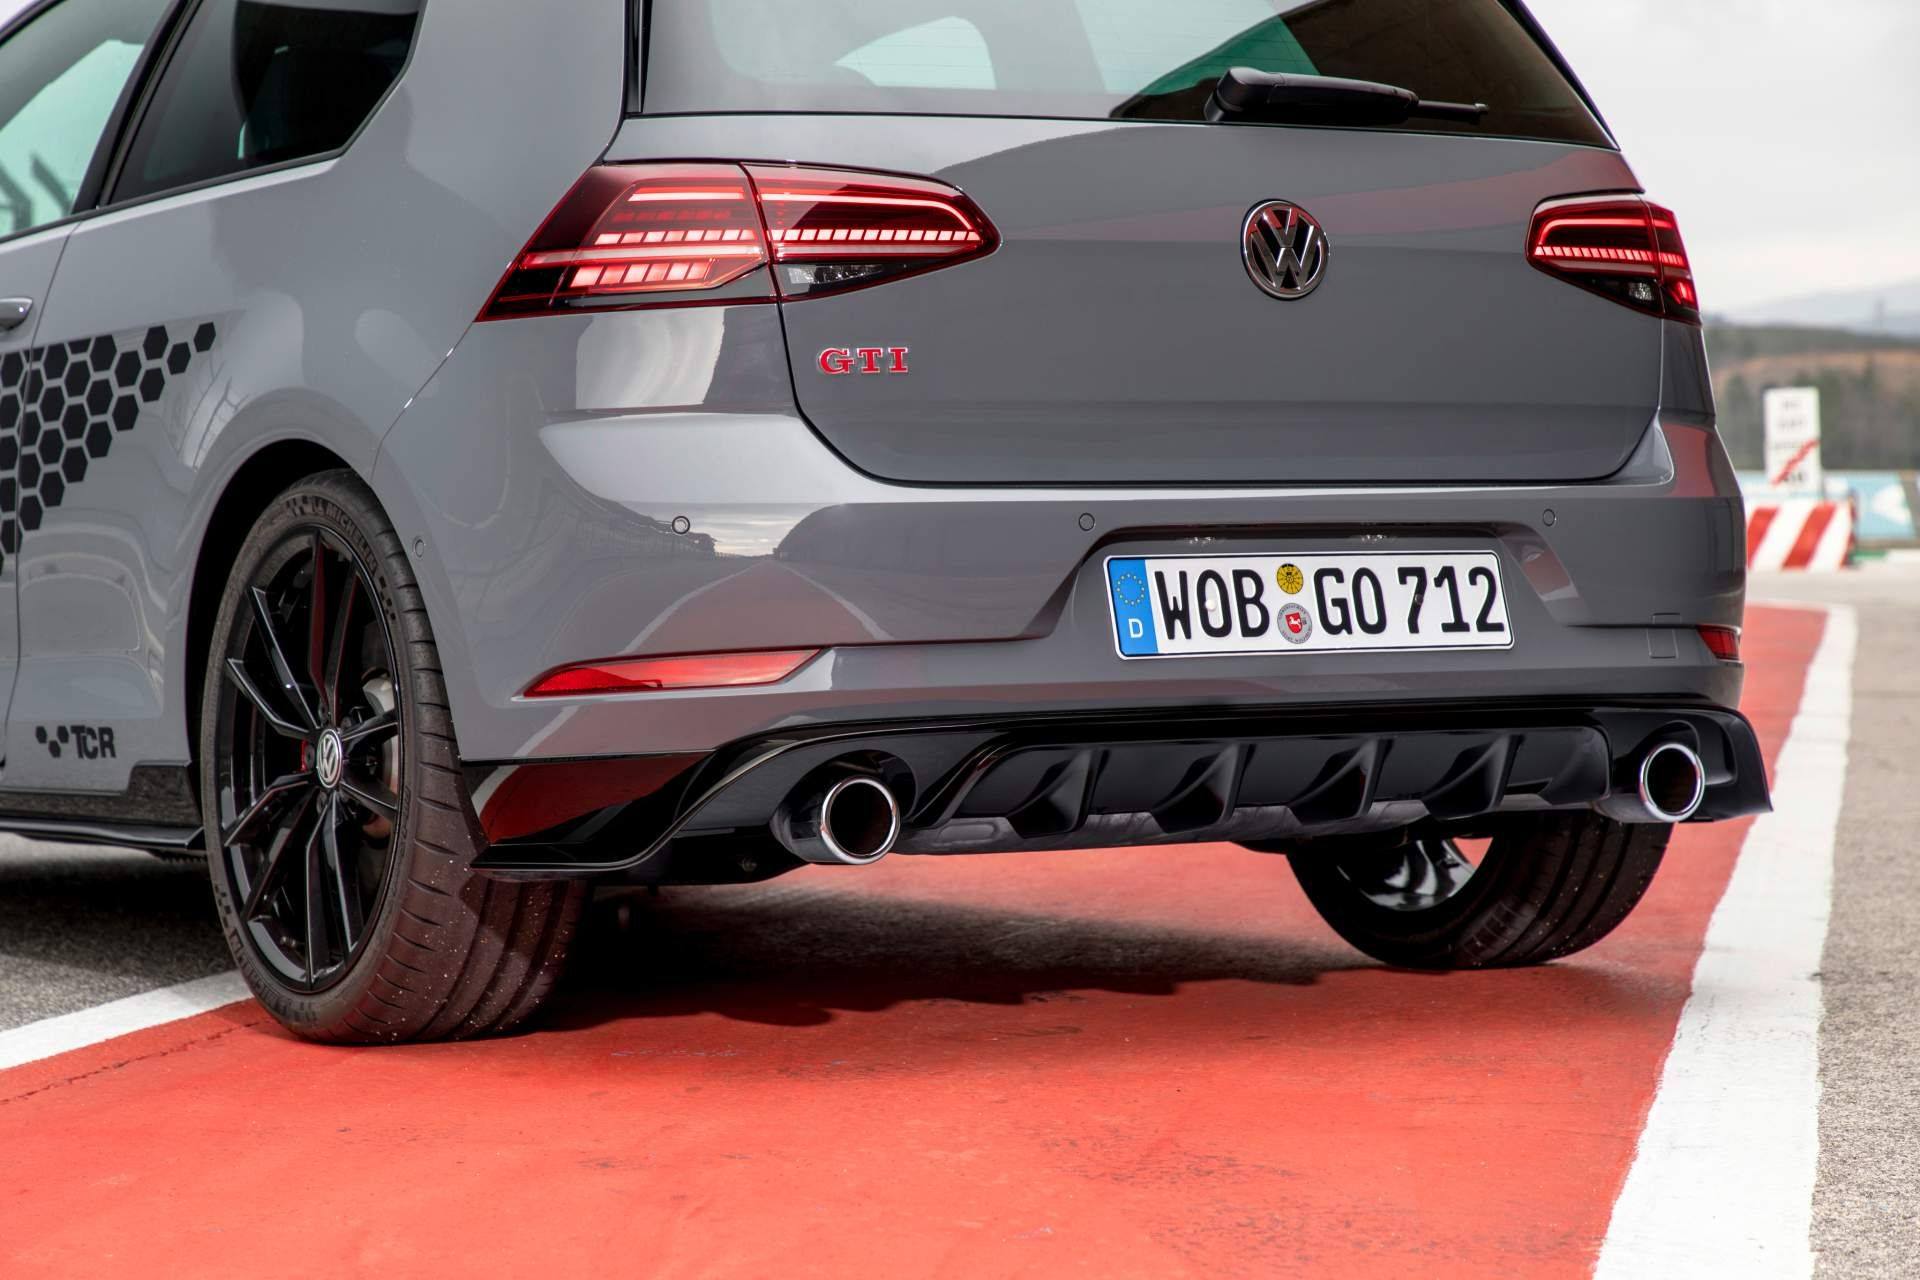 Vw Golf Gti Tcr Car Golf Gti Volkswagen Golf Gti Gti